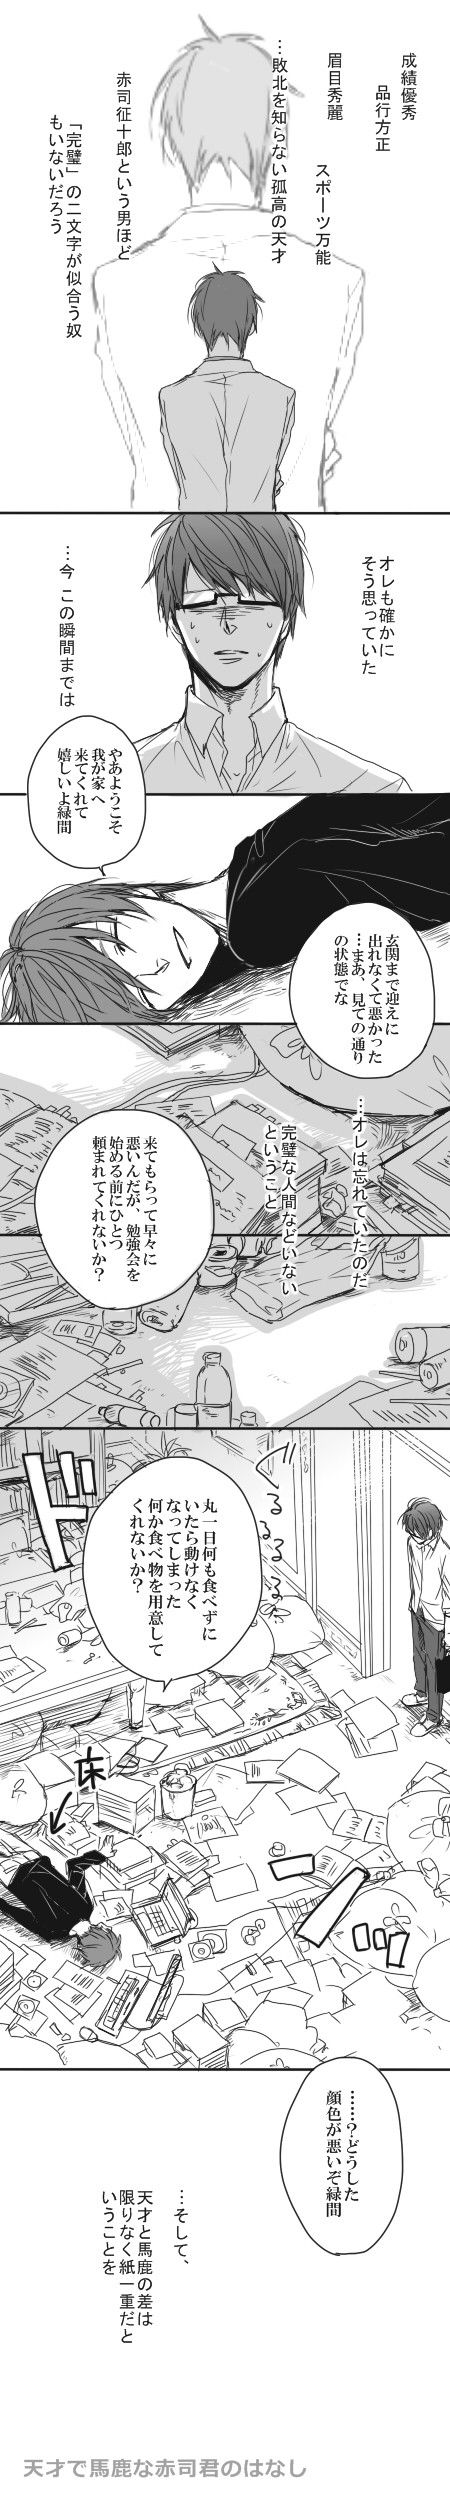 Midorima Shintarō x Akashi Seijūrō 緑間 真太郎 X 赤司征十郎 【綠赤】天才で馬鹿な赤司君のはなしその1